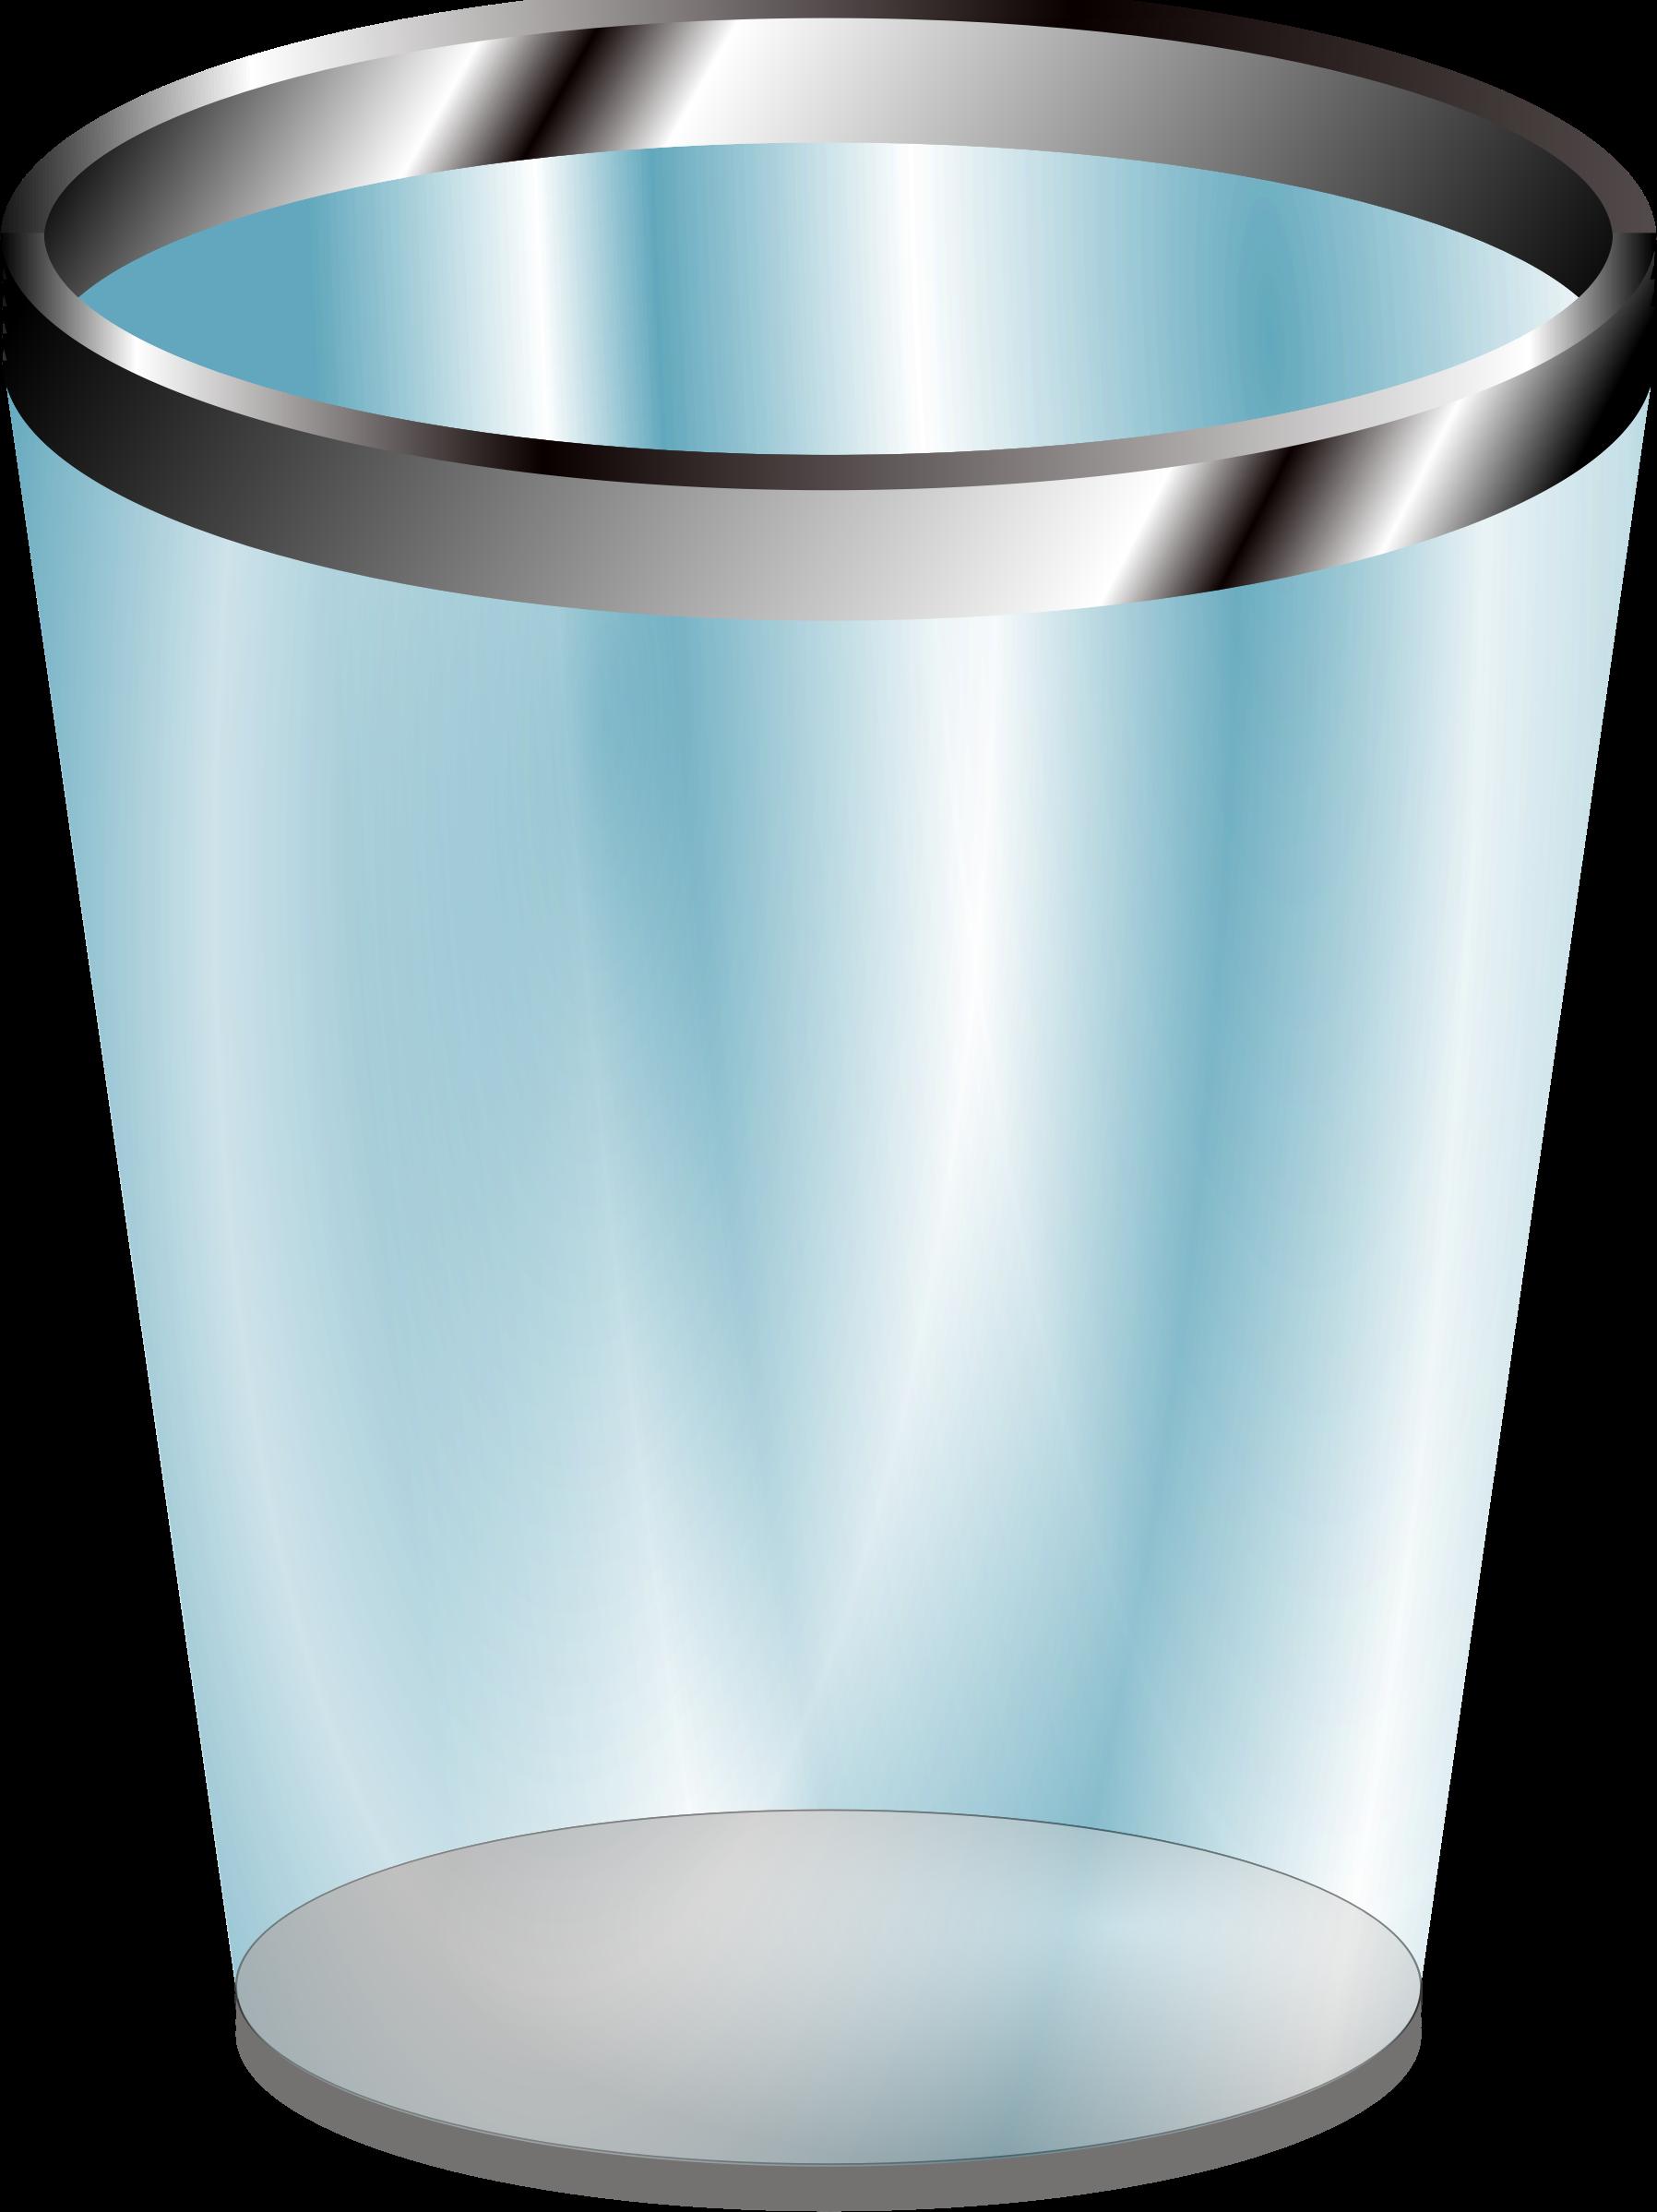 Trash clipart transparent Trash Can Transparent Trash Clipart